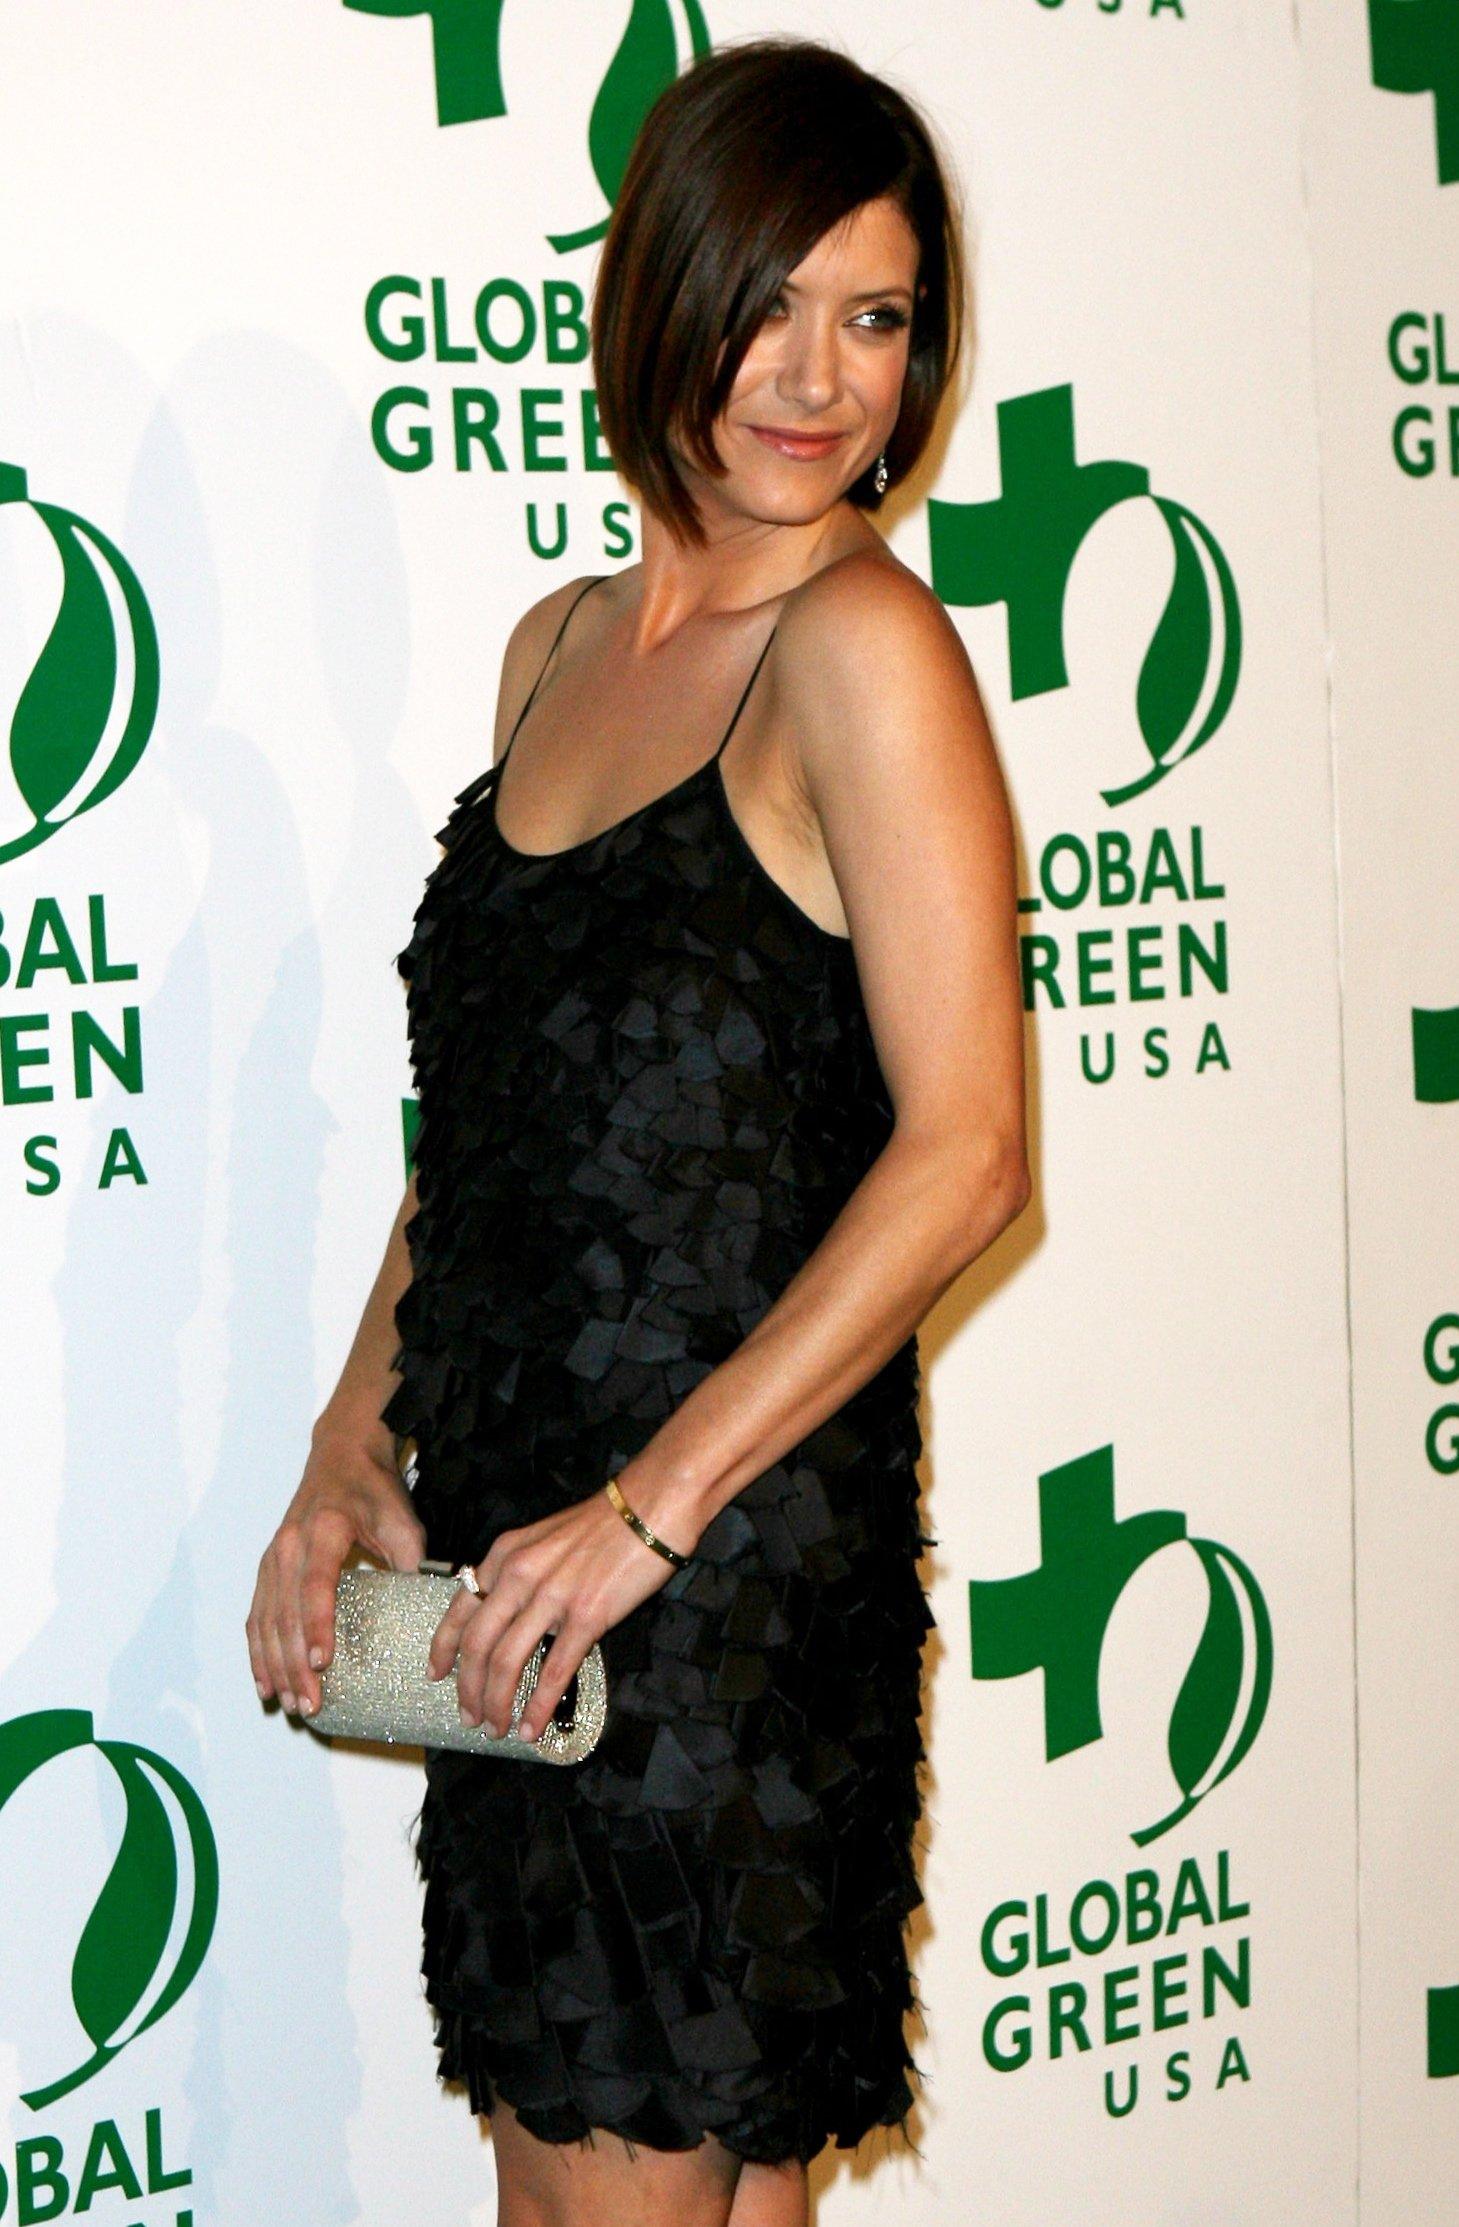 53330_Celebutopia-Kate_Walsh-Global_Green_Pre-Oscar_Party-10_122_347lo.JPG